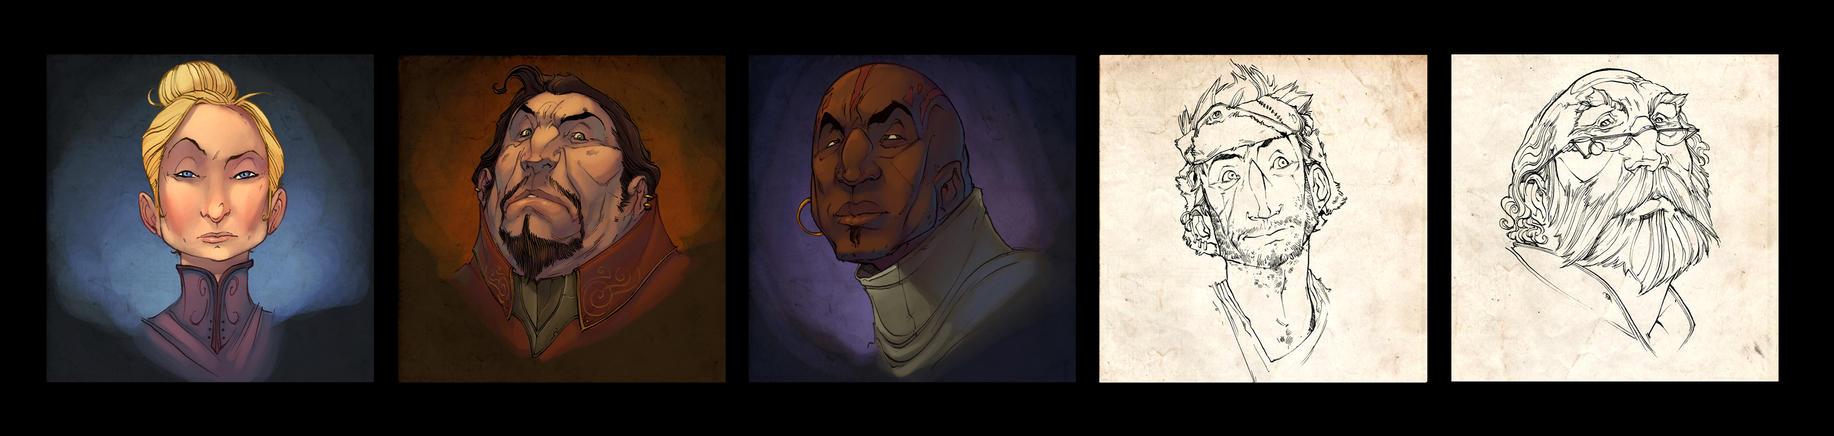 Abandoned Character Studies by nicholaskole